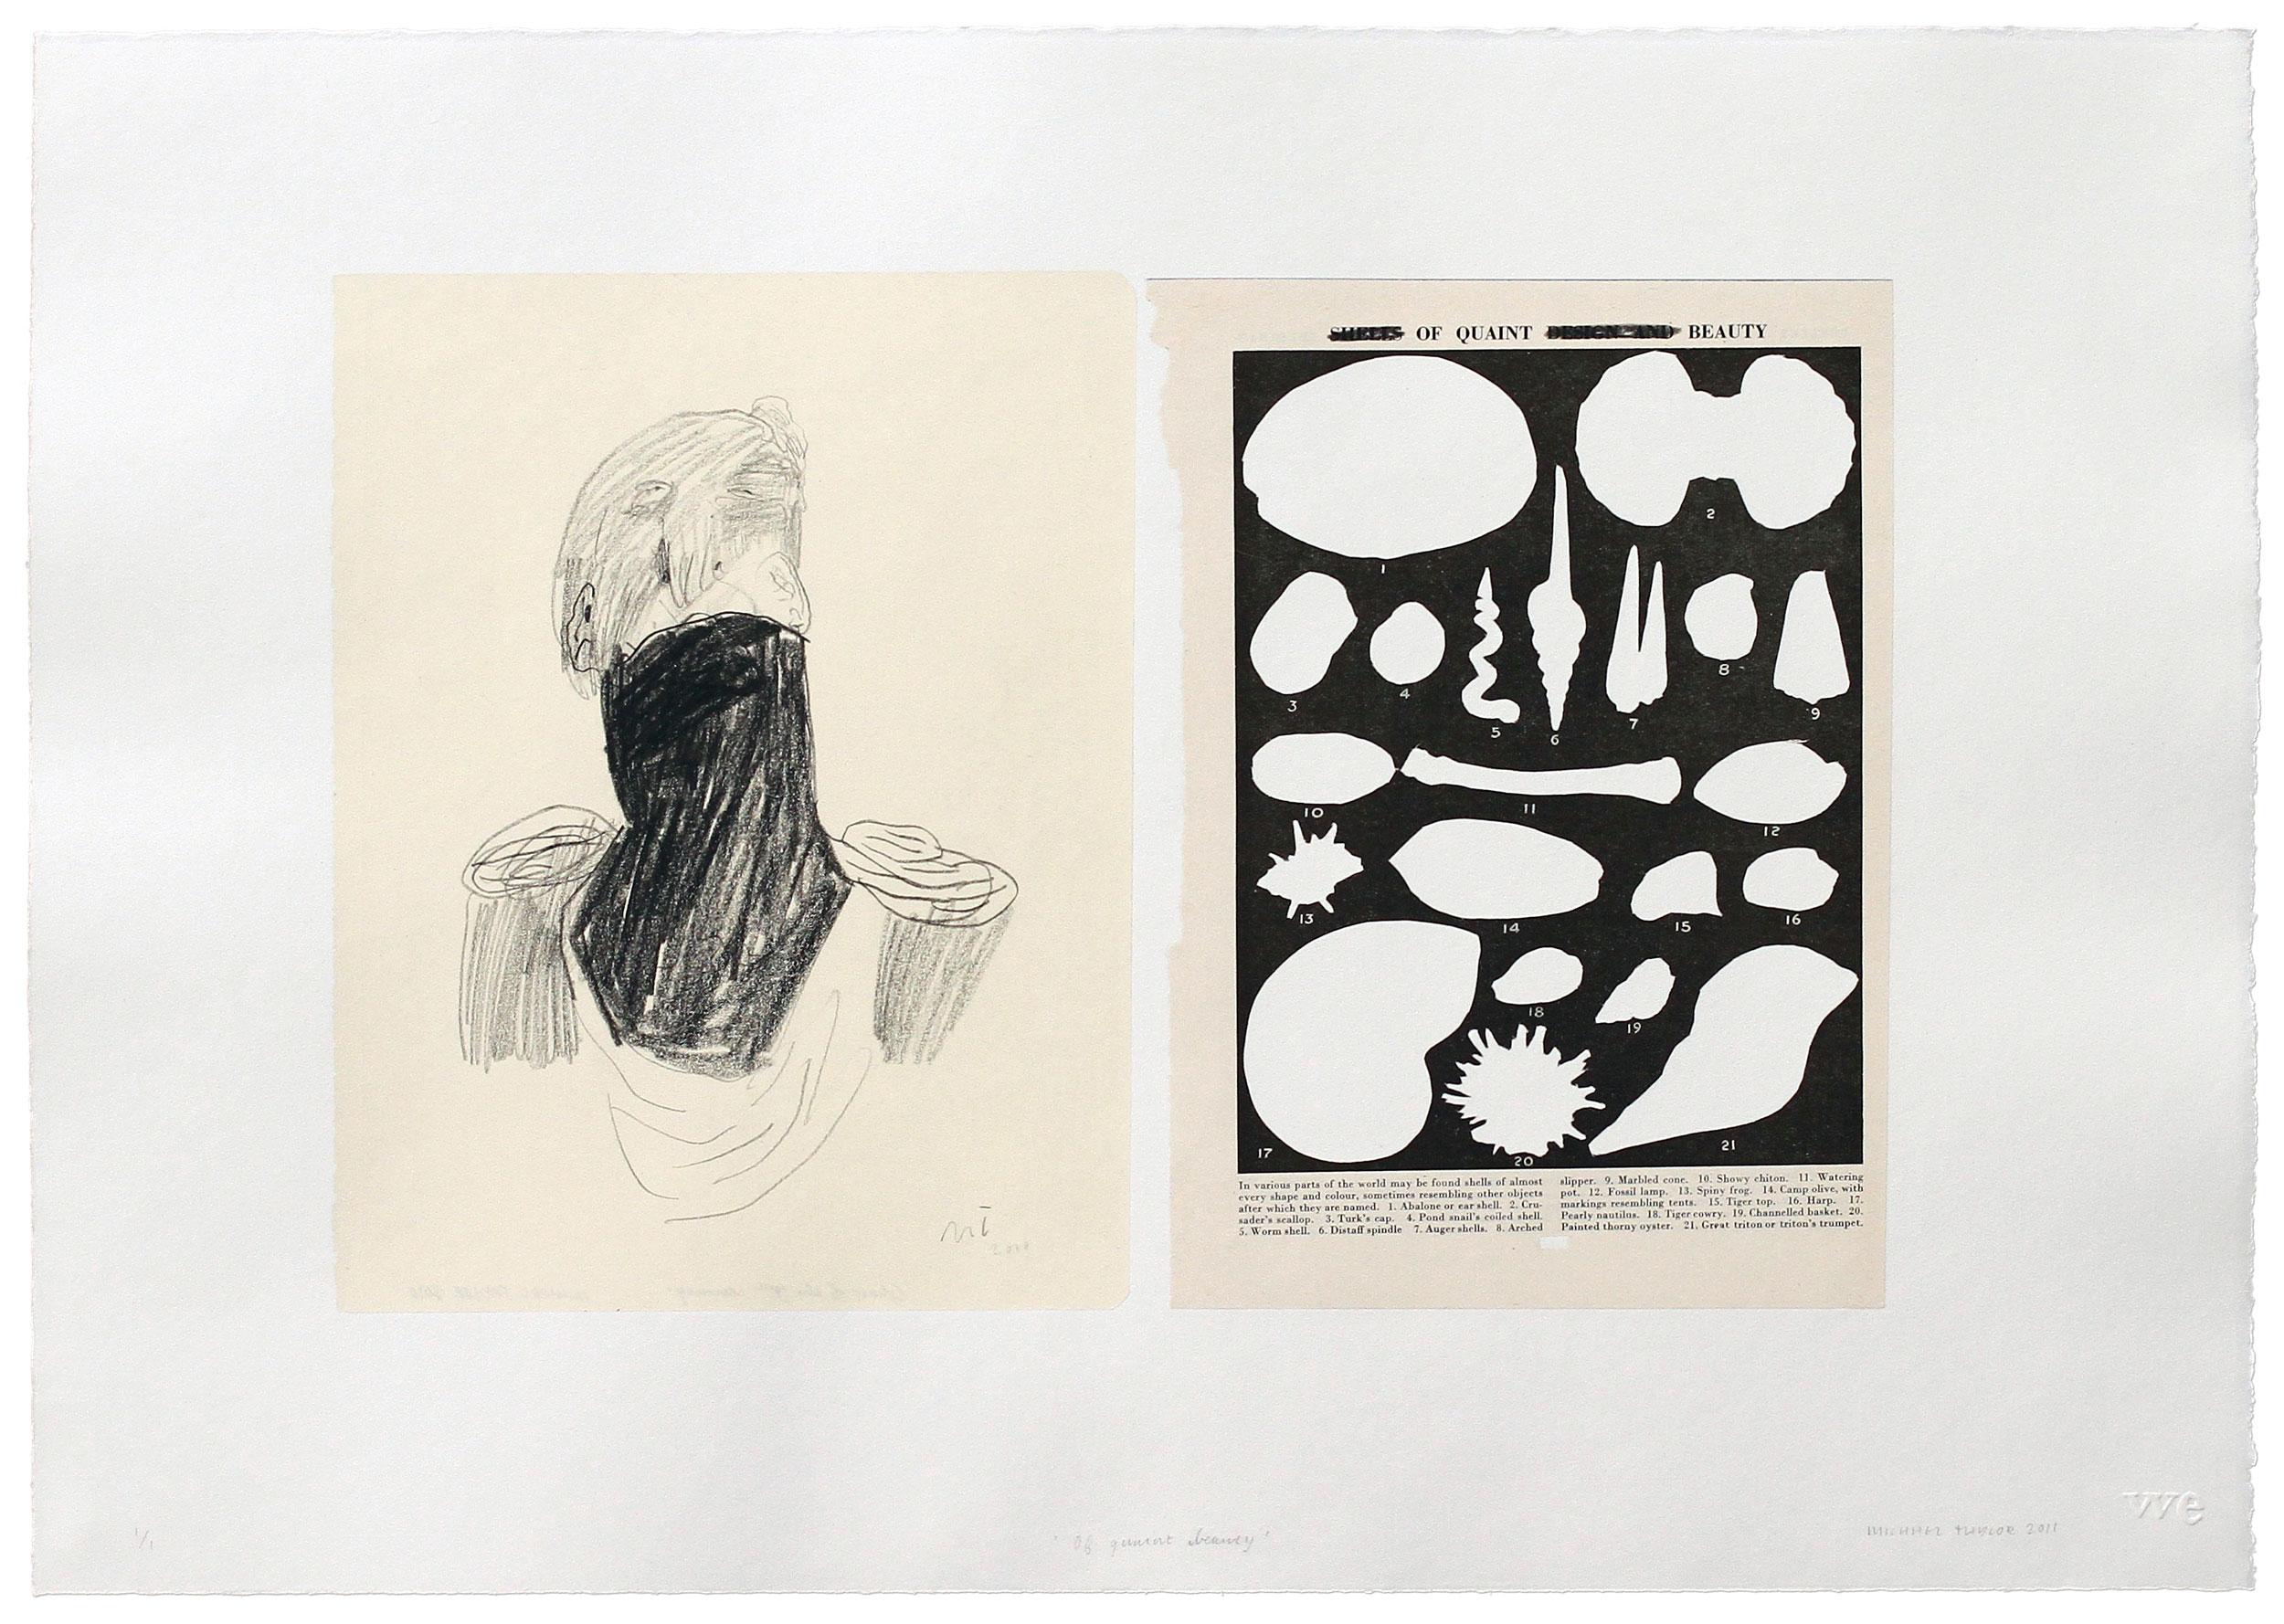 Michael Taylor Prints Printmaking Collage Drawing